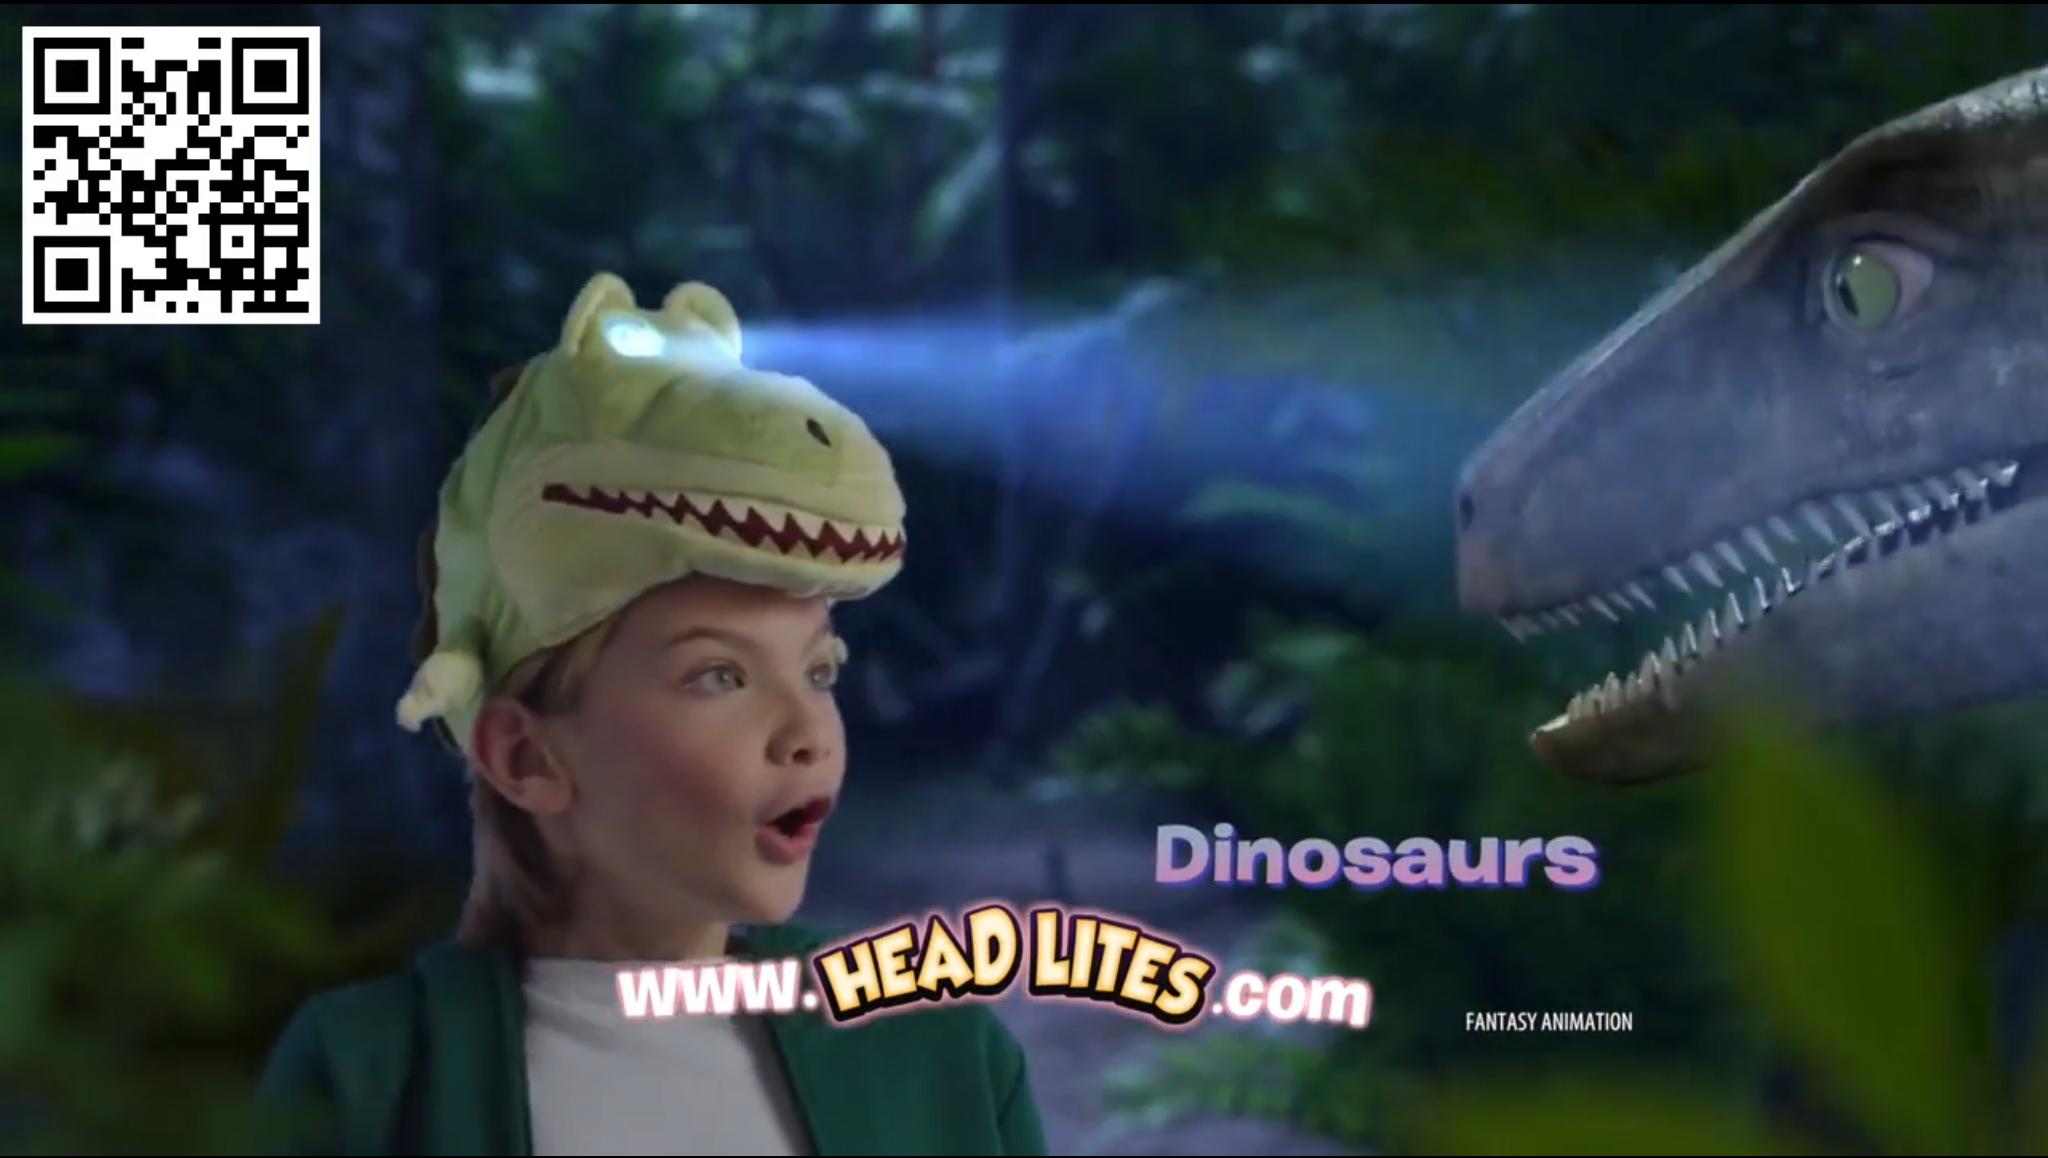 Head Lites (Hog Wild Toys Comercial)